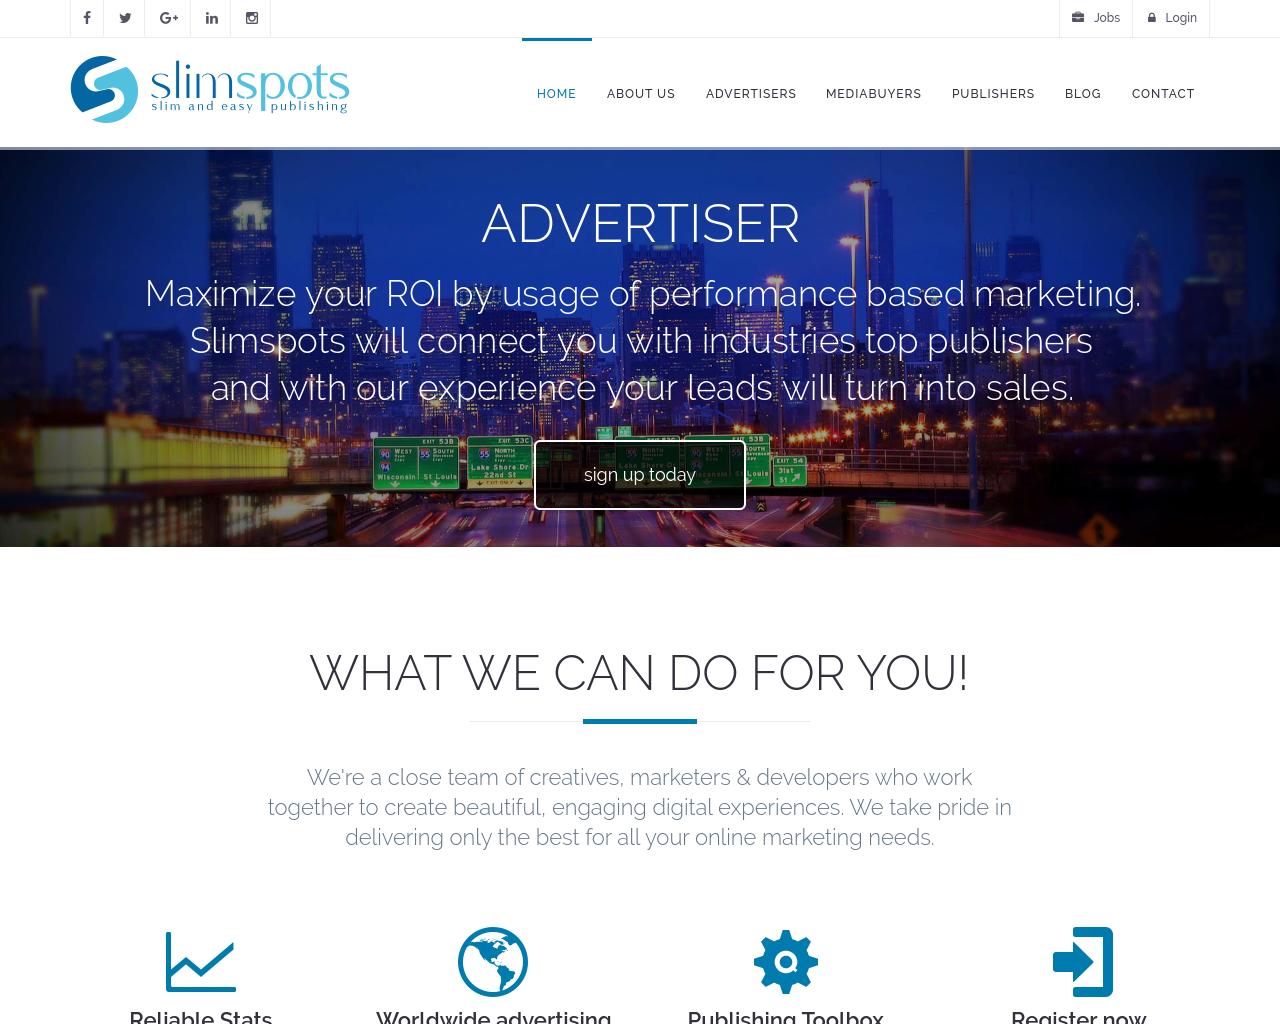 SlimSPOTS-Advertising-Reviews-Pricing